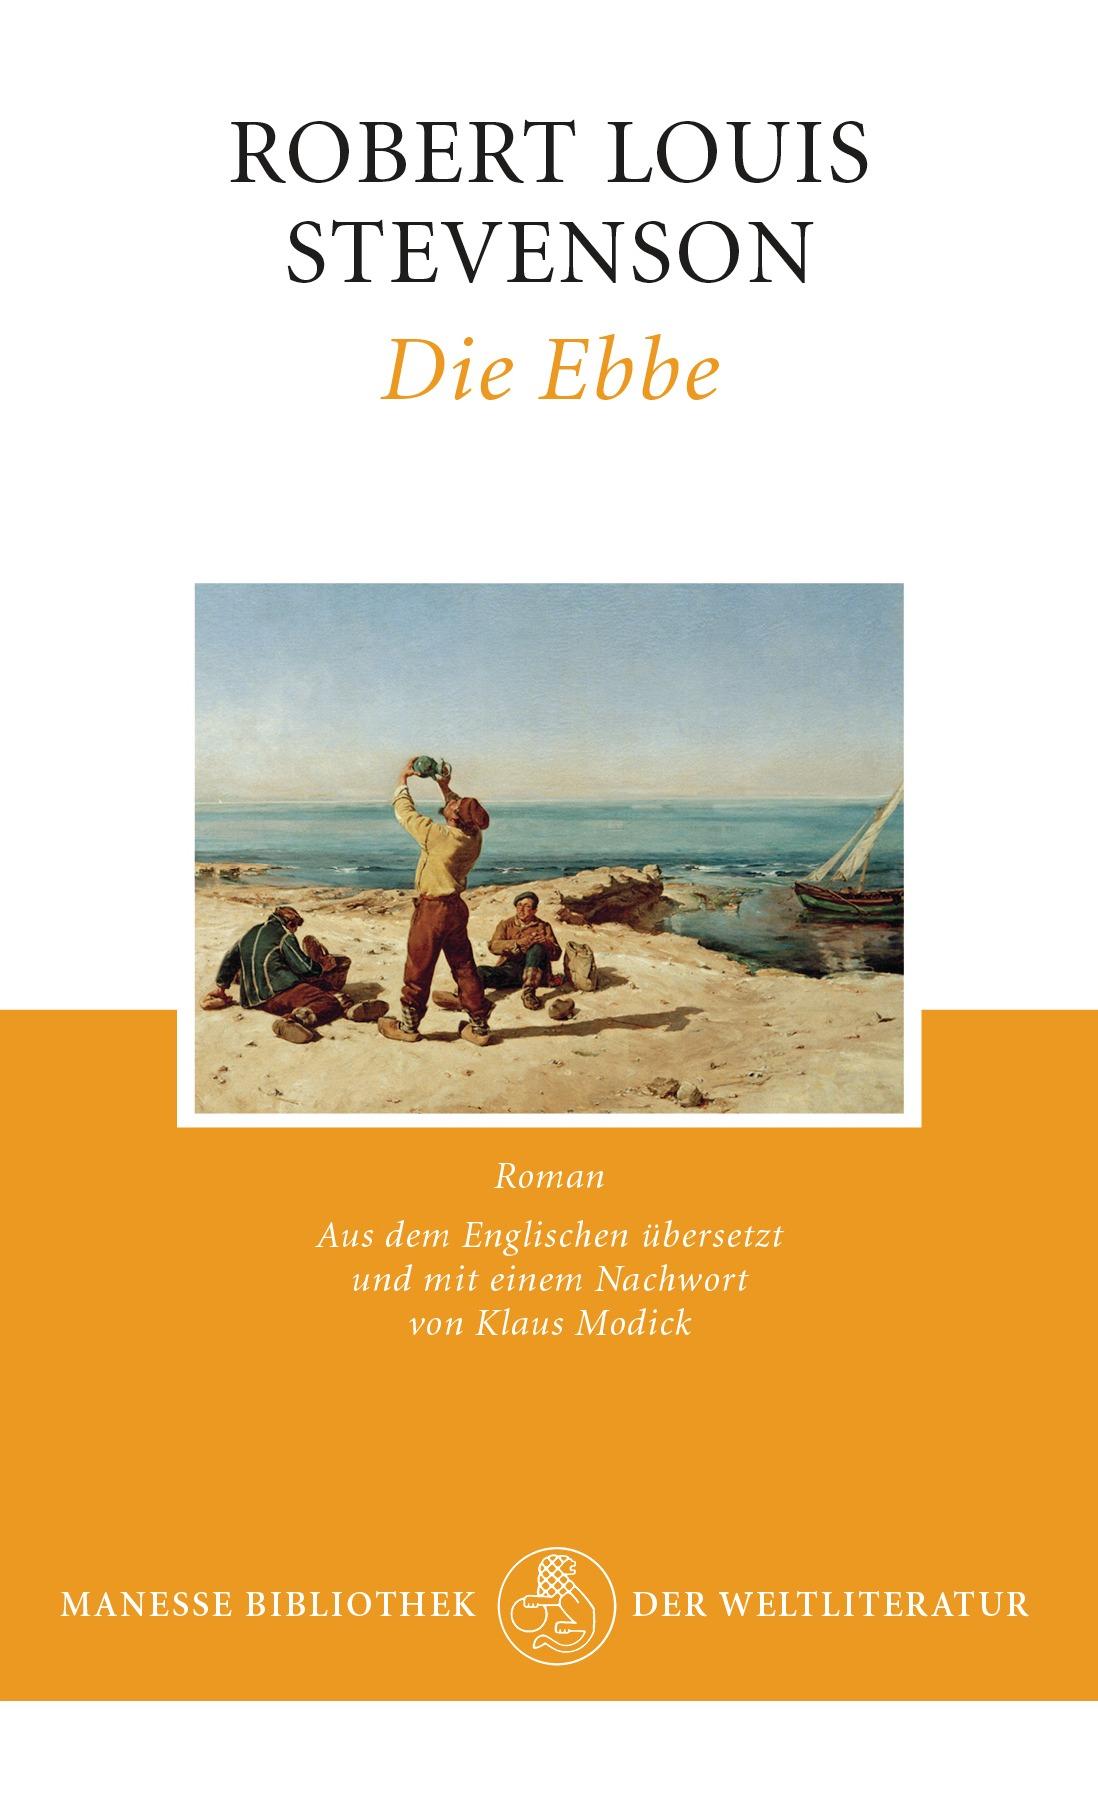 Die Ebbe - Robert Louis Stevenson